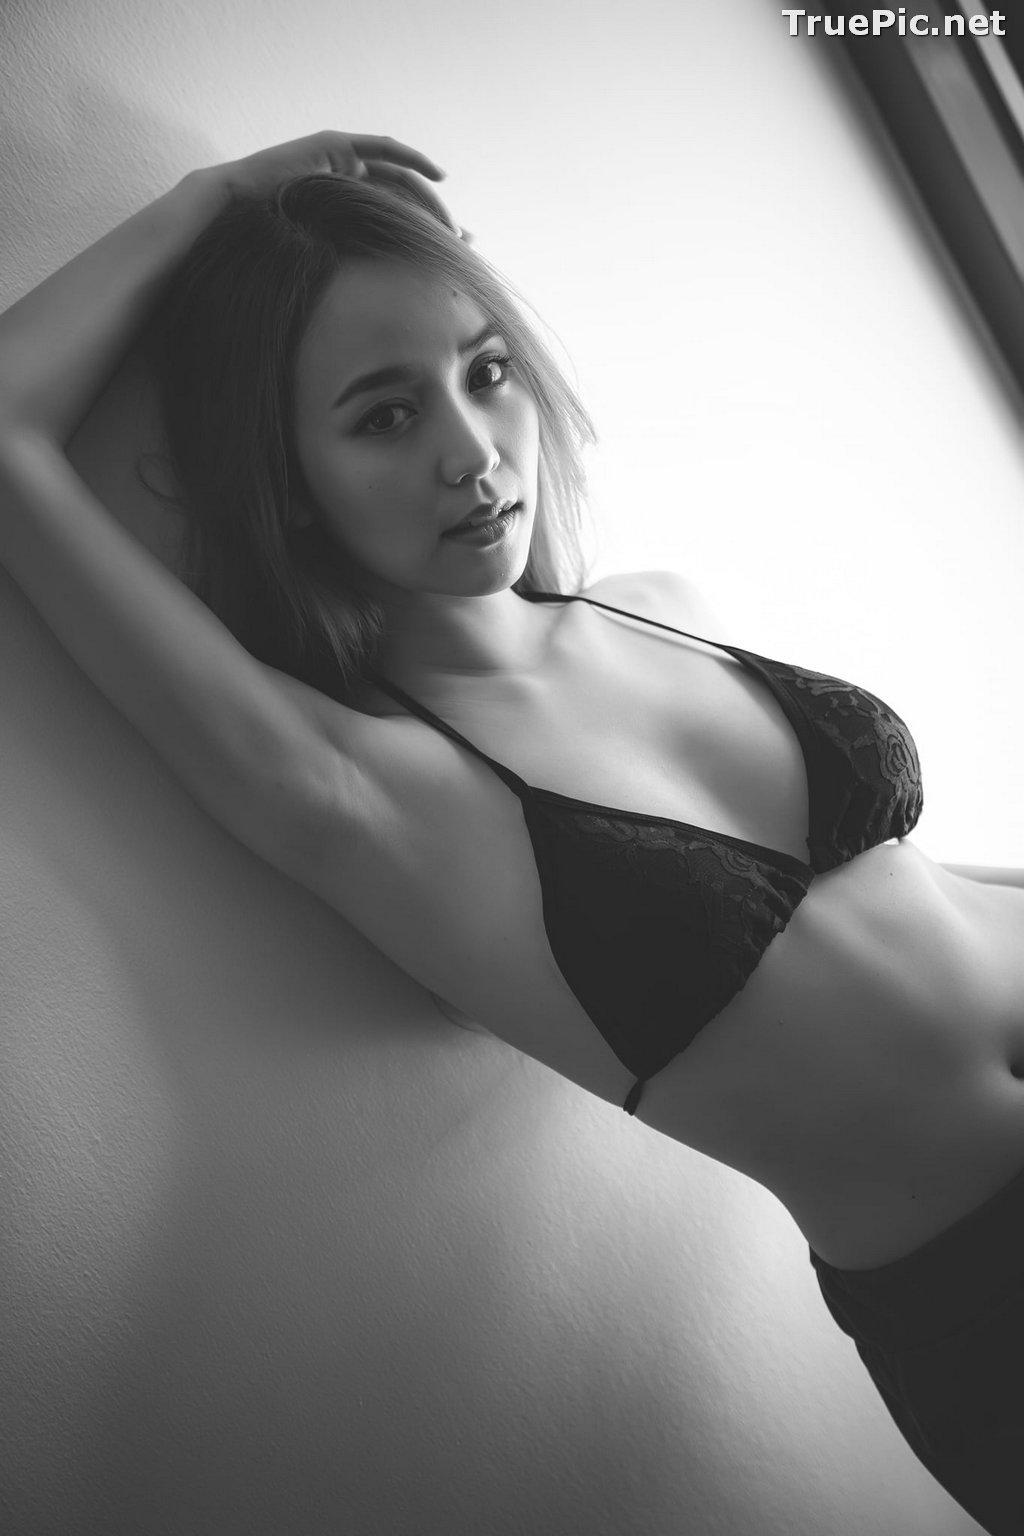 Image Thailand Model - Noppawan Limapirak (น้องเมย์) - Beautiful Picture 2021 Collection - TruePic.net - Picture-26